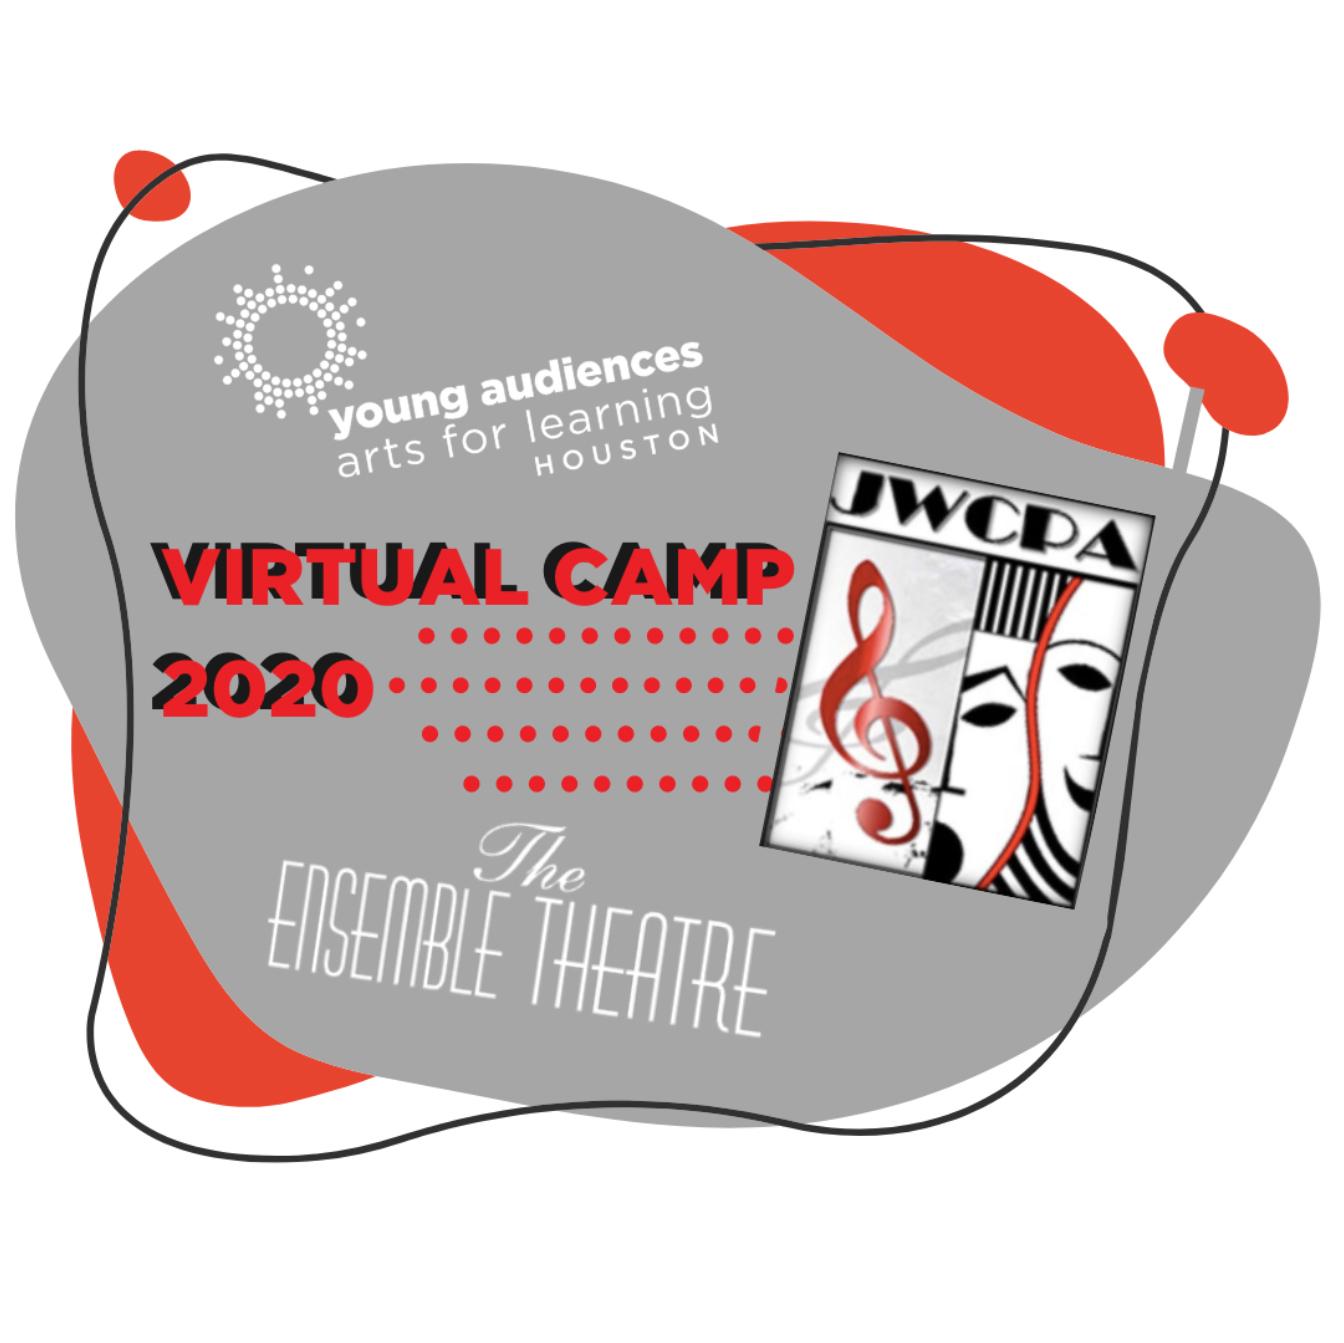 JWCPA Virtual Mini Camp